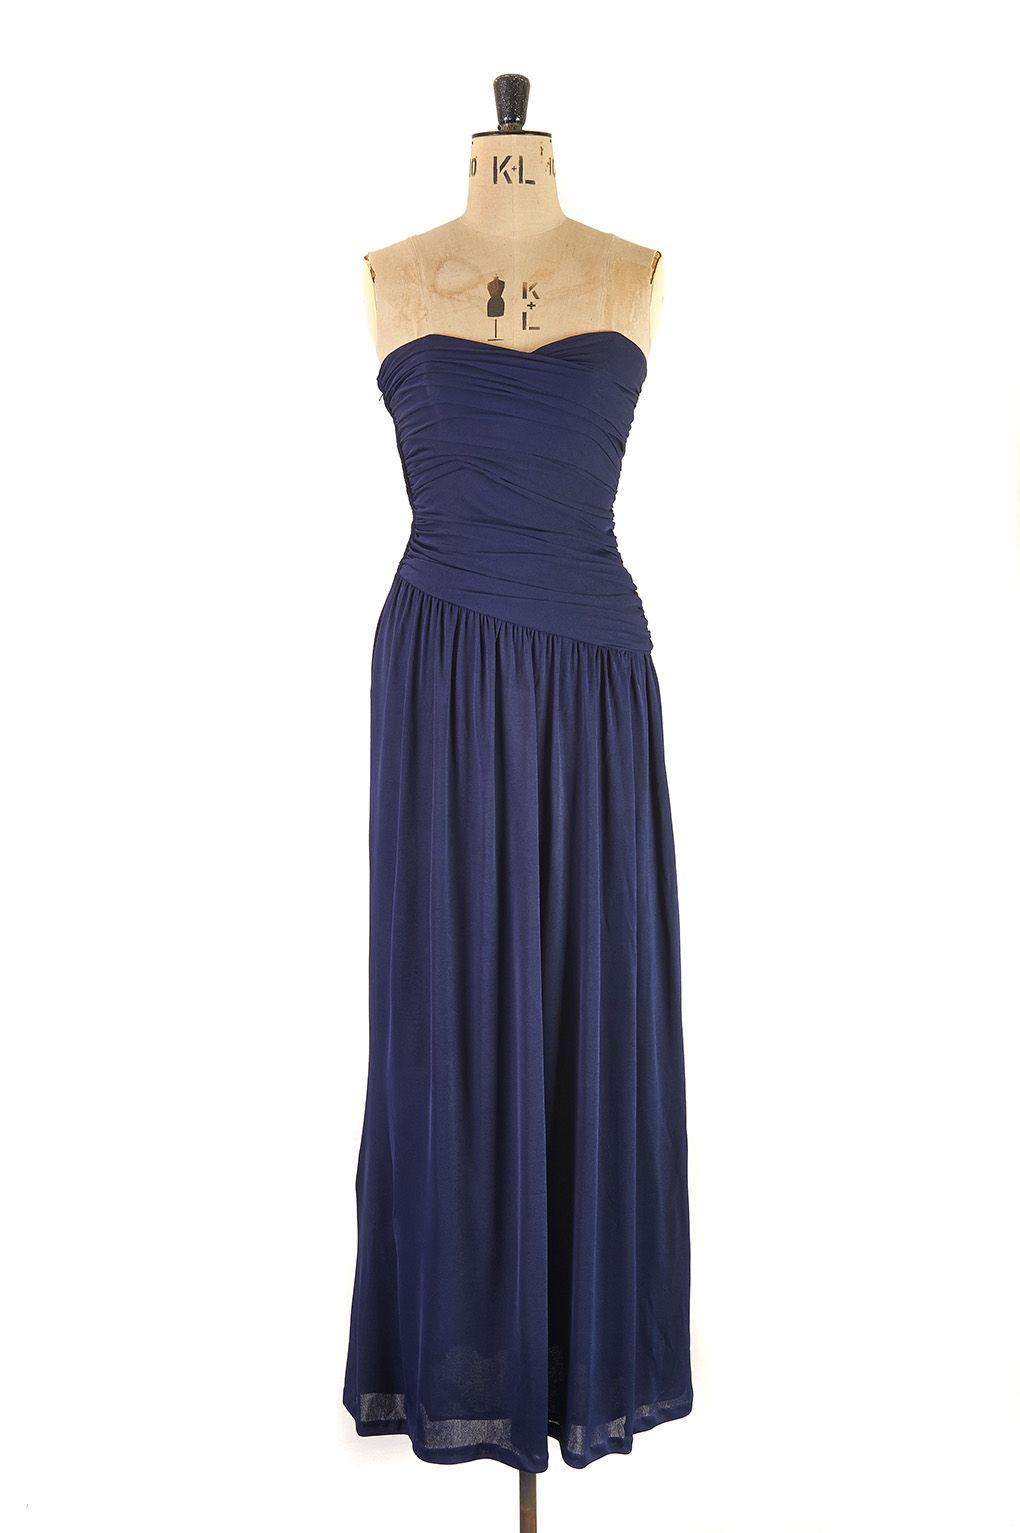 Grecian Evening Gown by Frank Usher c.1970   Margot & Hesse   Margot ...